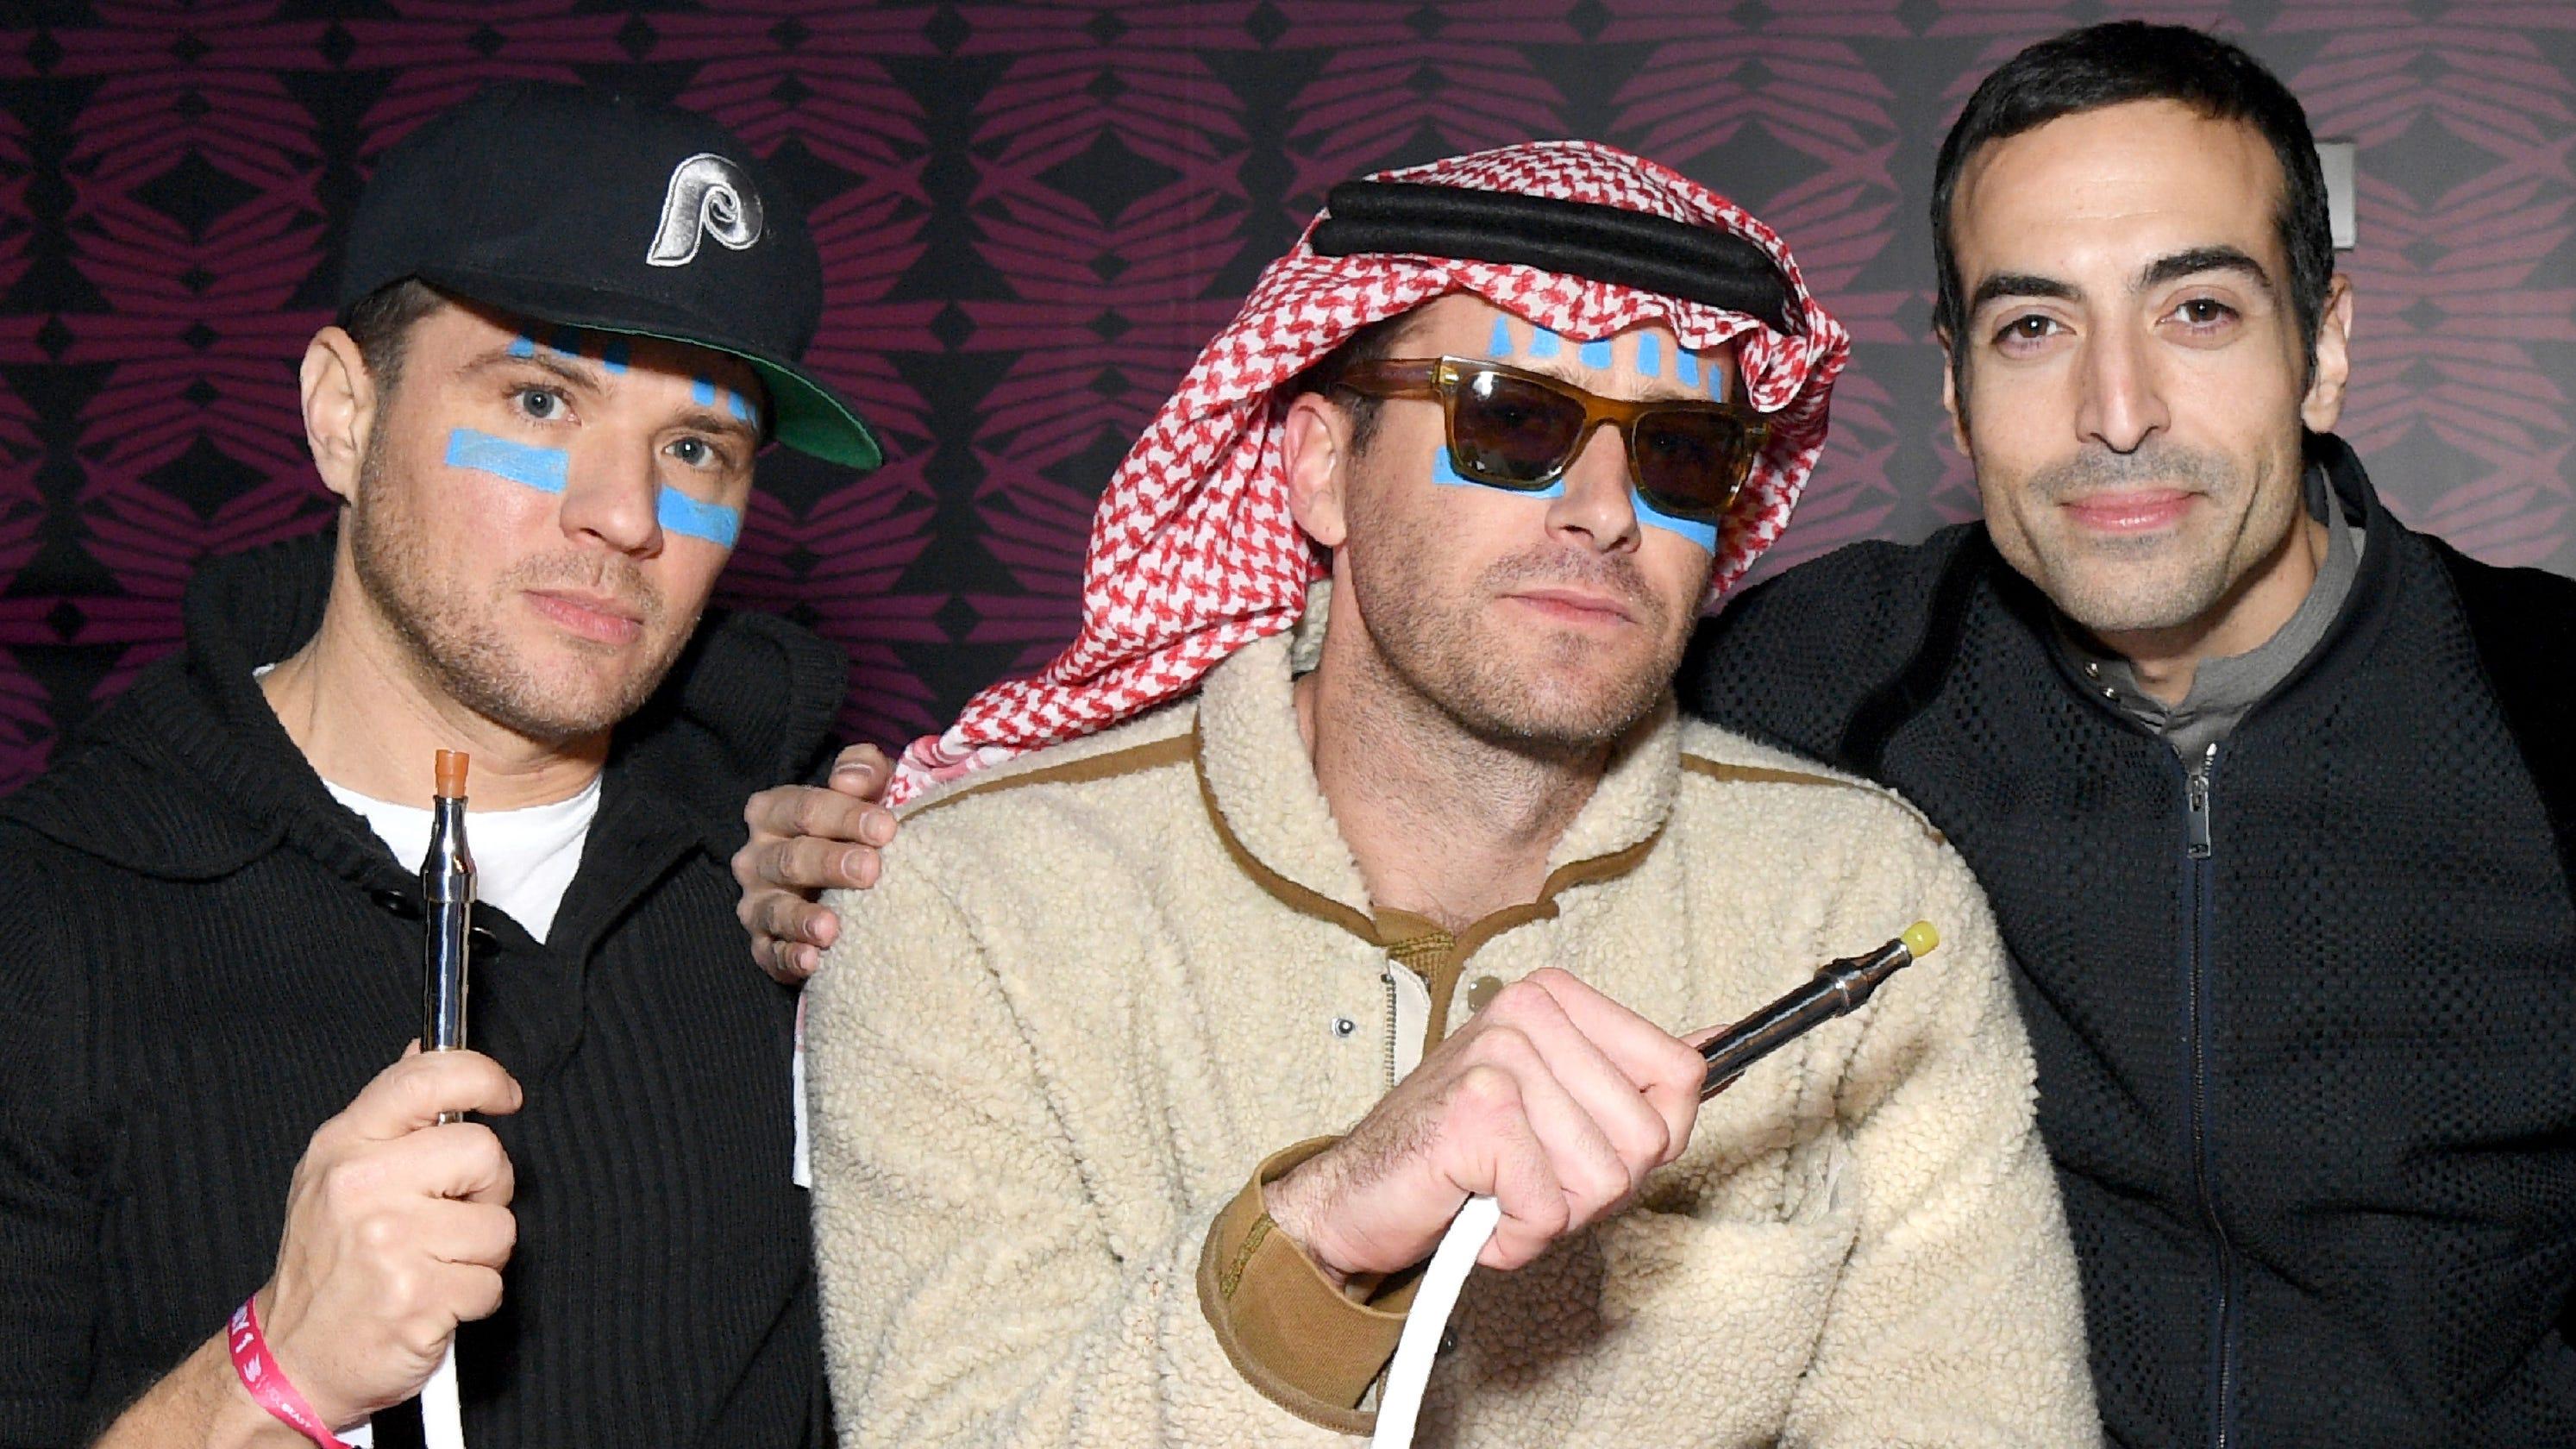 MDL Beast Fest: Why are celebrities spreading Saudi propaganda?